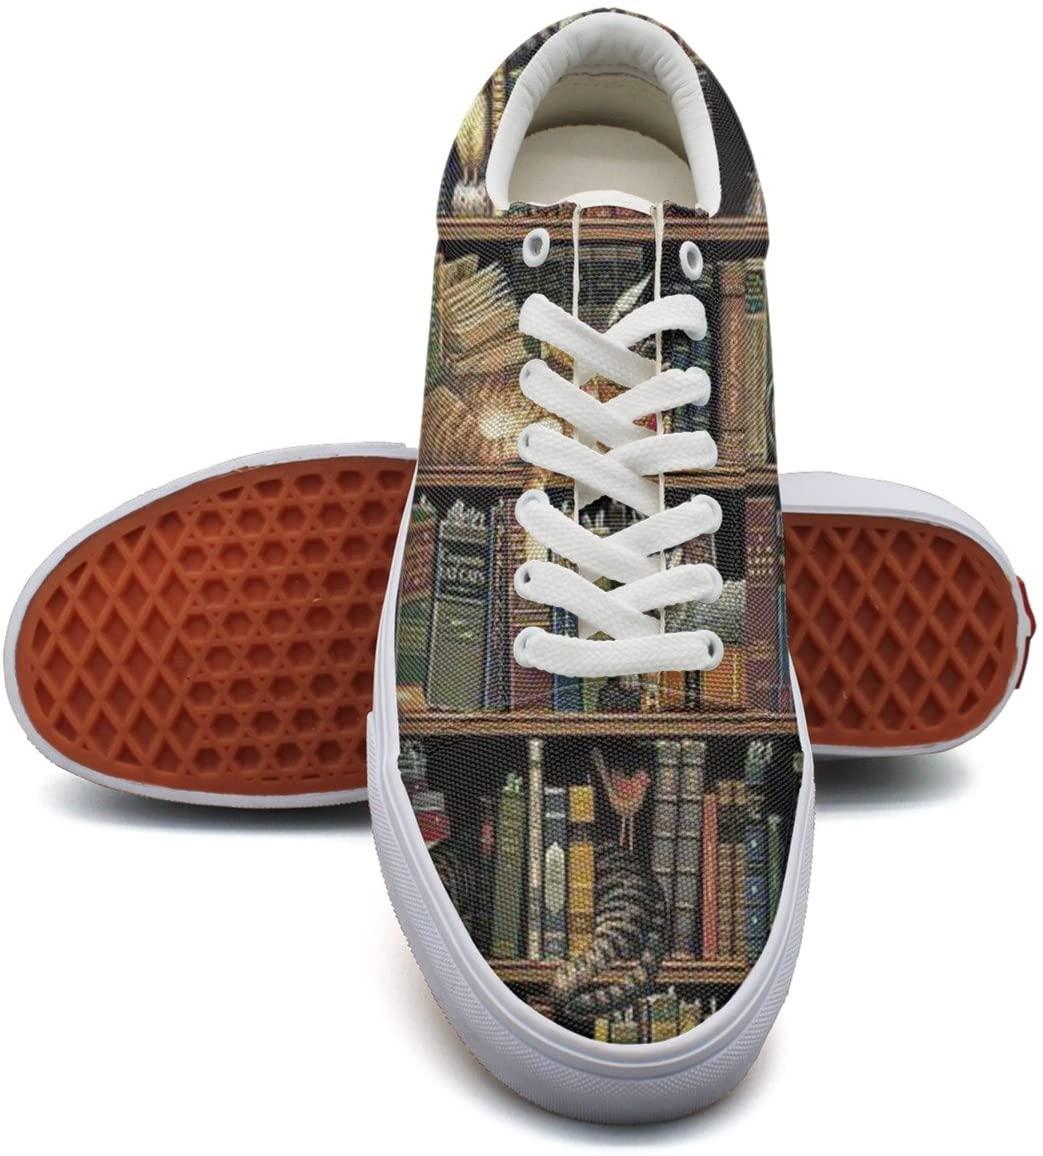 Ouxioaz Womens Action Shoes Vintage Books And Libraries Canvas Tennis Shoes